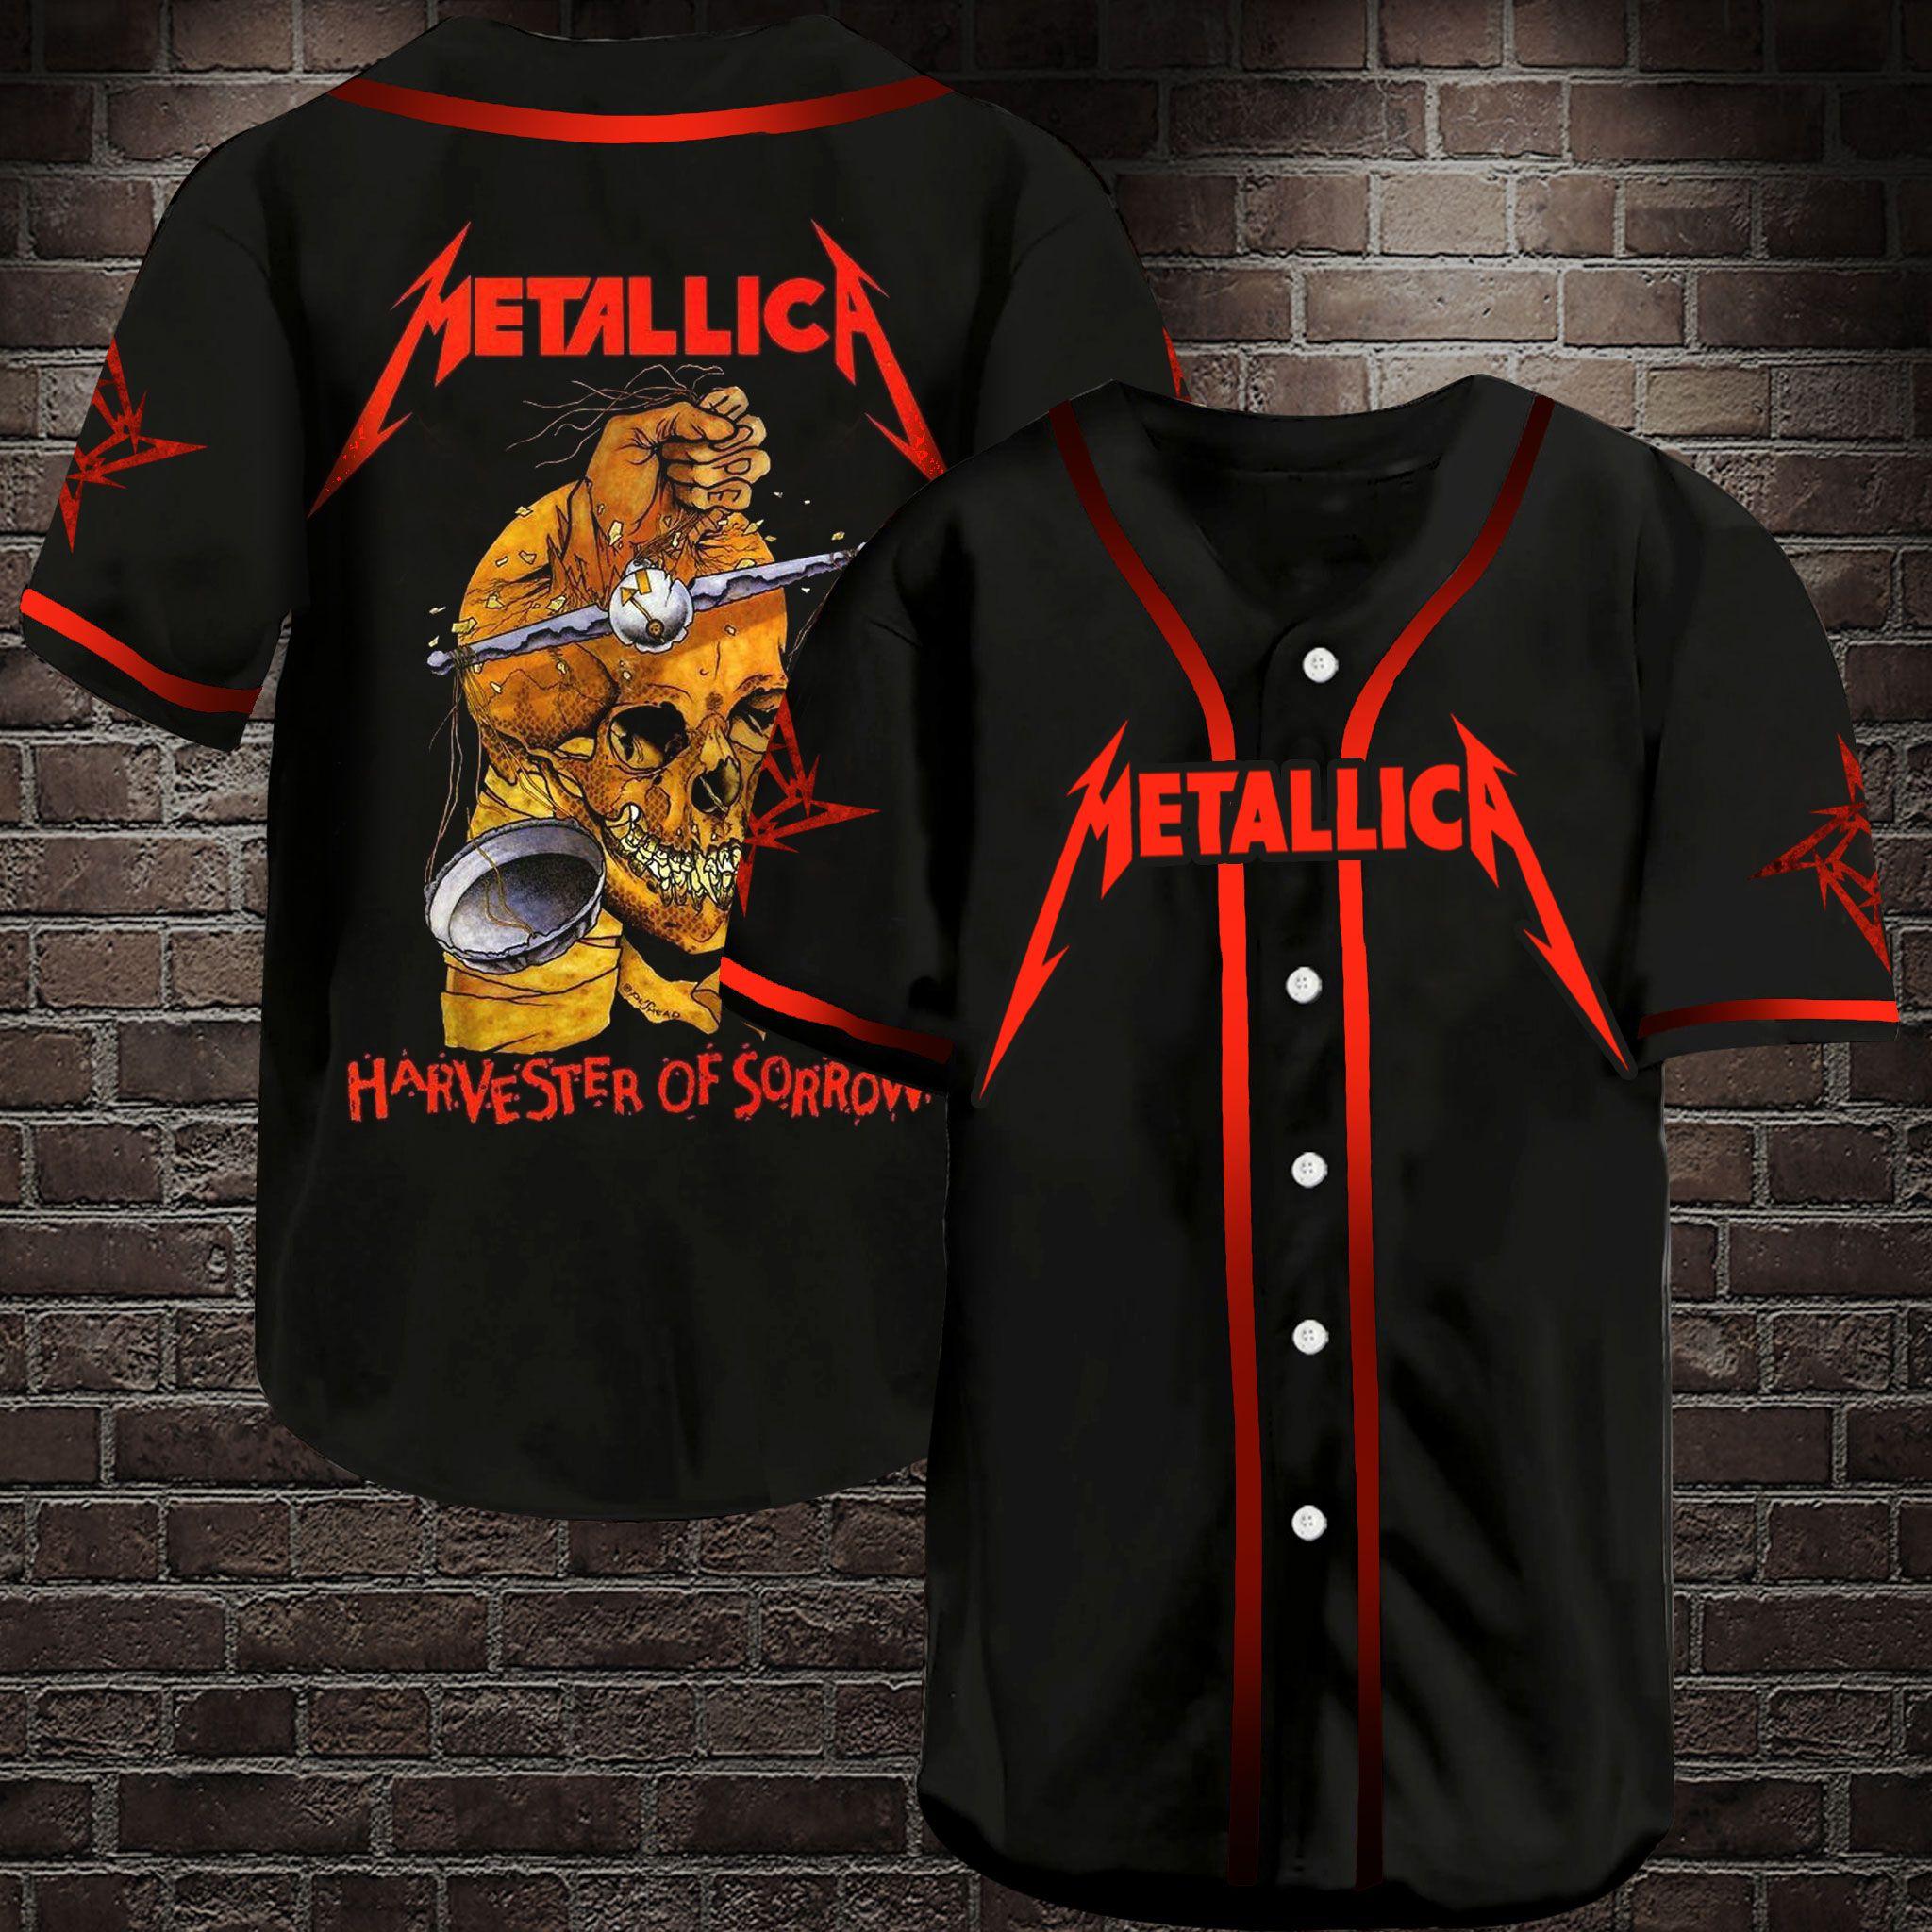 Metallica Harvester of Sorrow Baseball Jersey Shirt